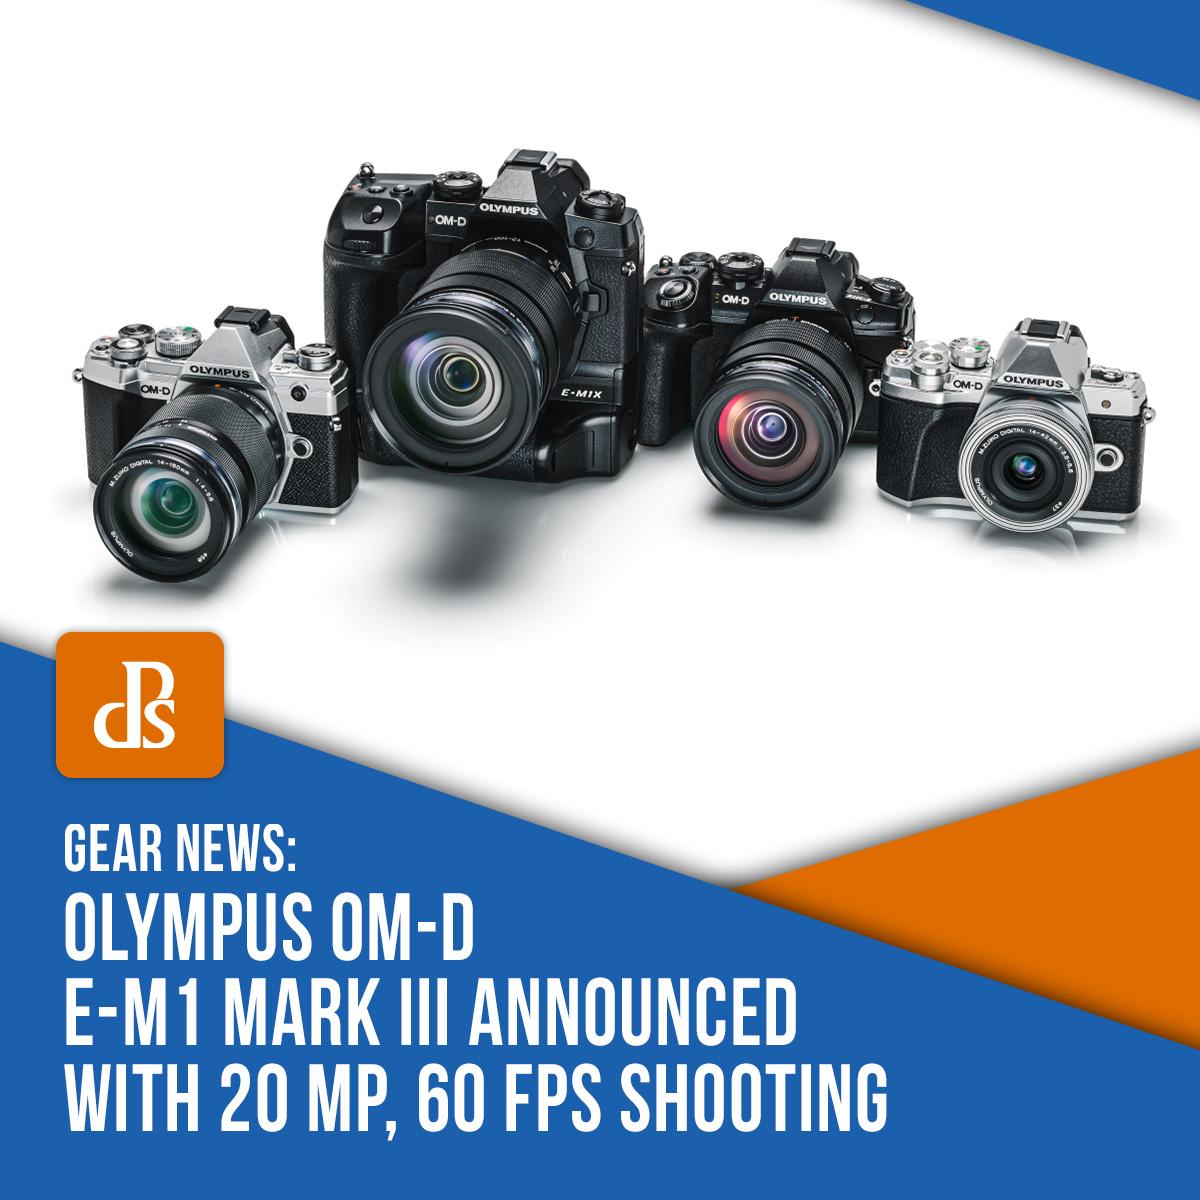 Olympus-OM-D-E-M1-Mark-III-Announced